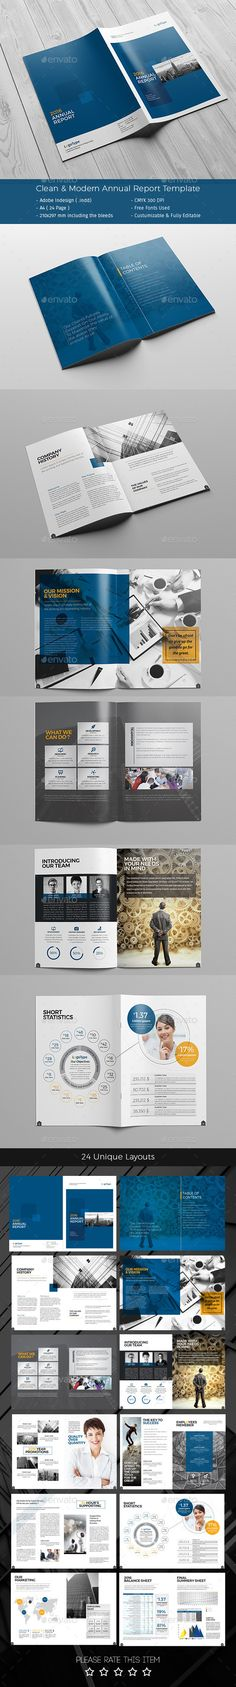 Annual Report #design Download: http://graphicriver.net/item/annual-report-template/12313507?ref=ksioks